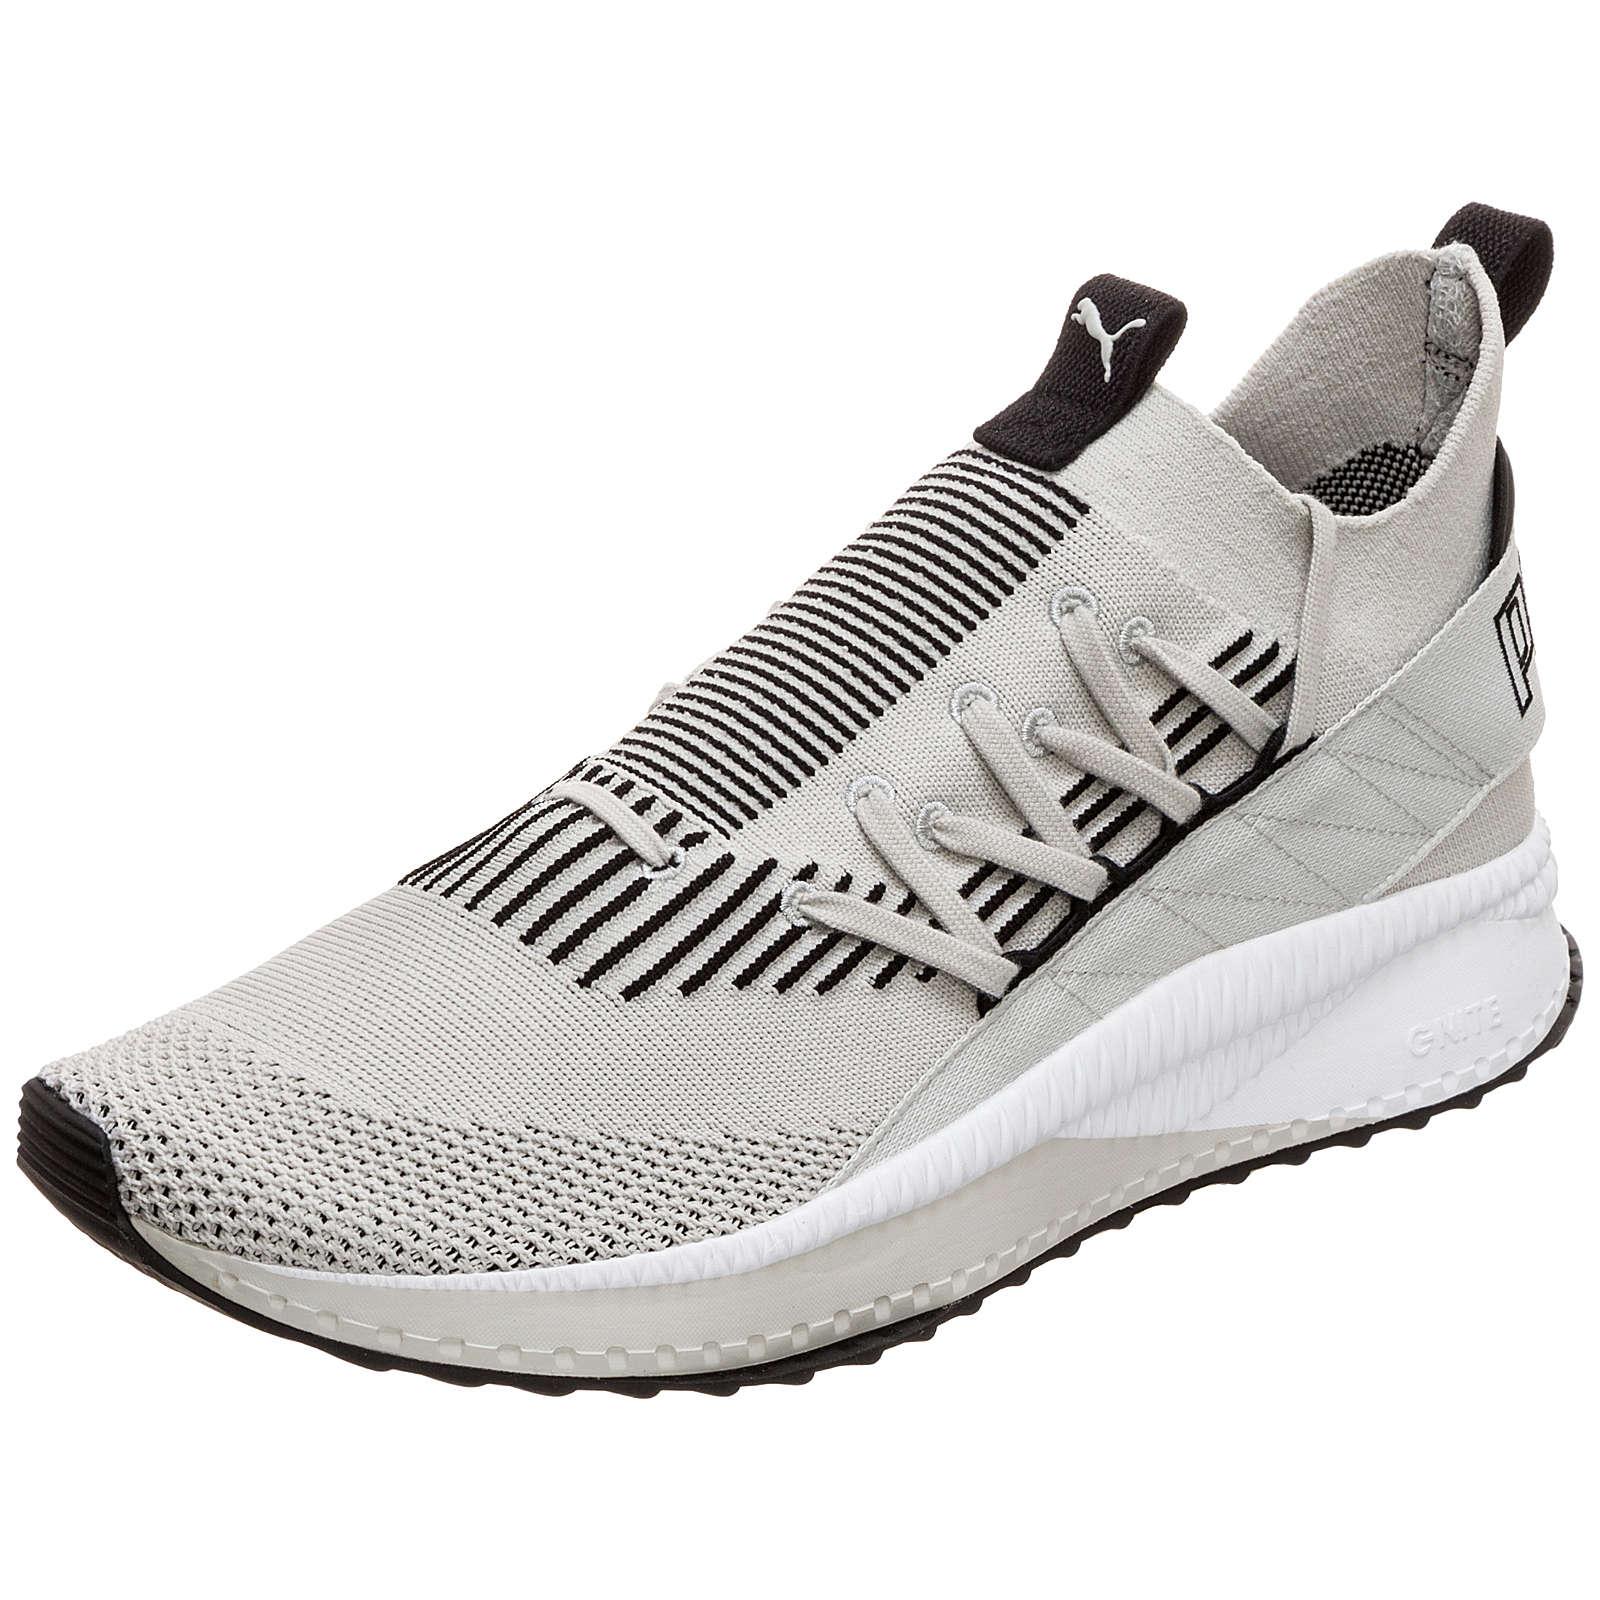 PUMA TSUGI Kai Jun Sneaker grau Gr. 44,5